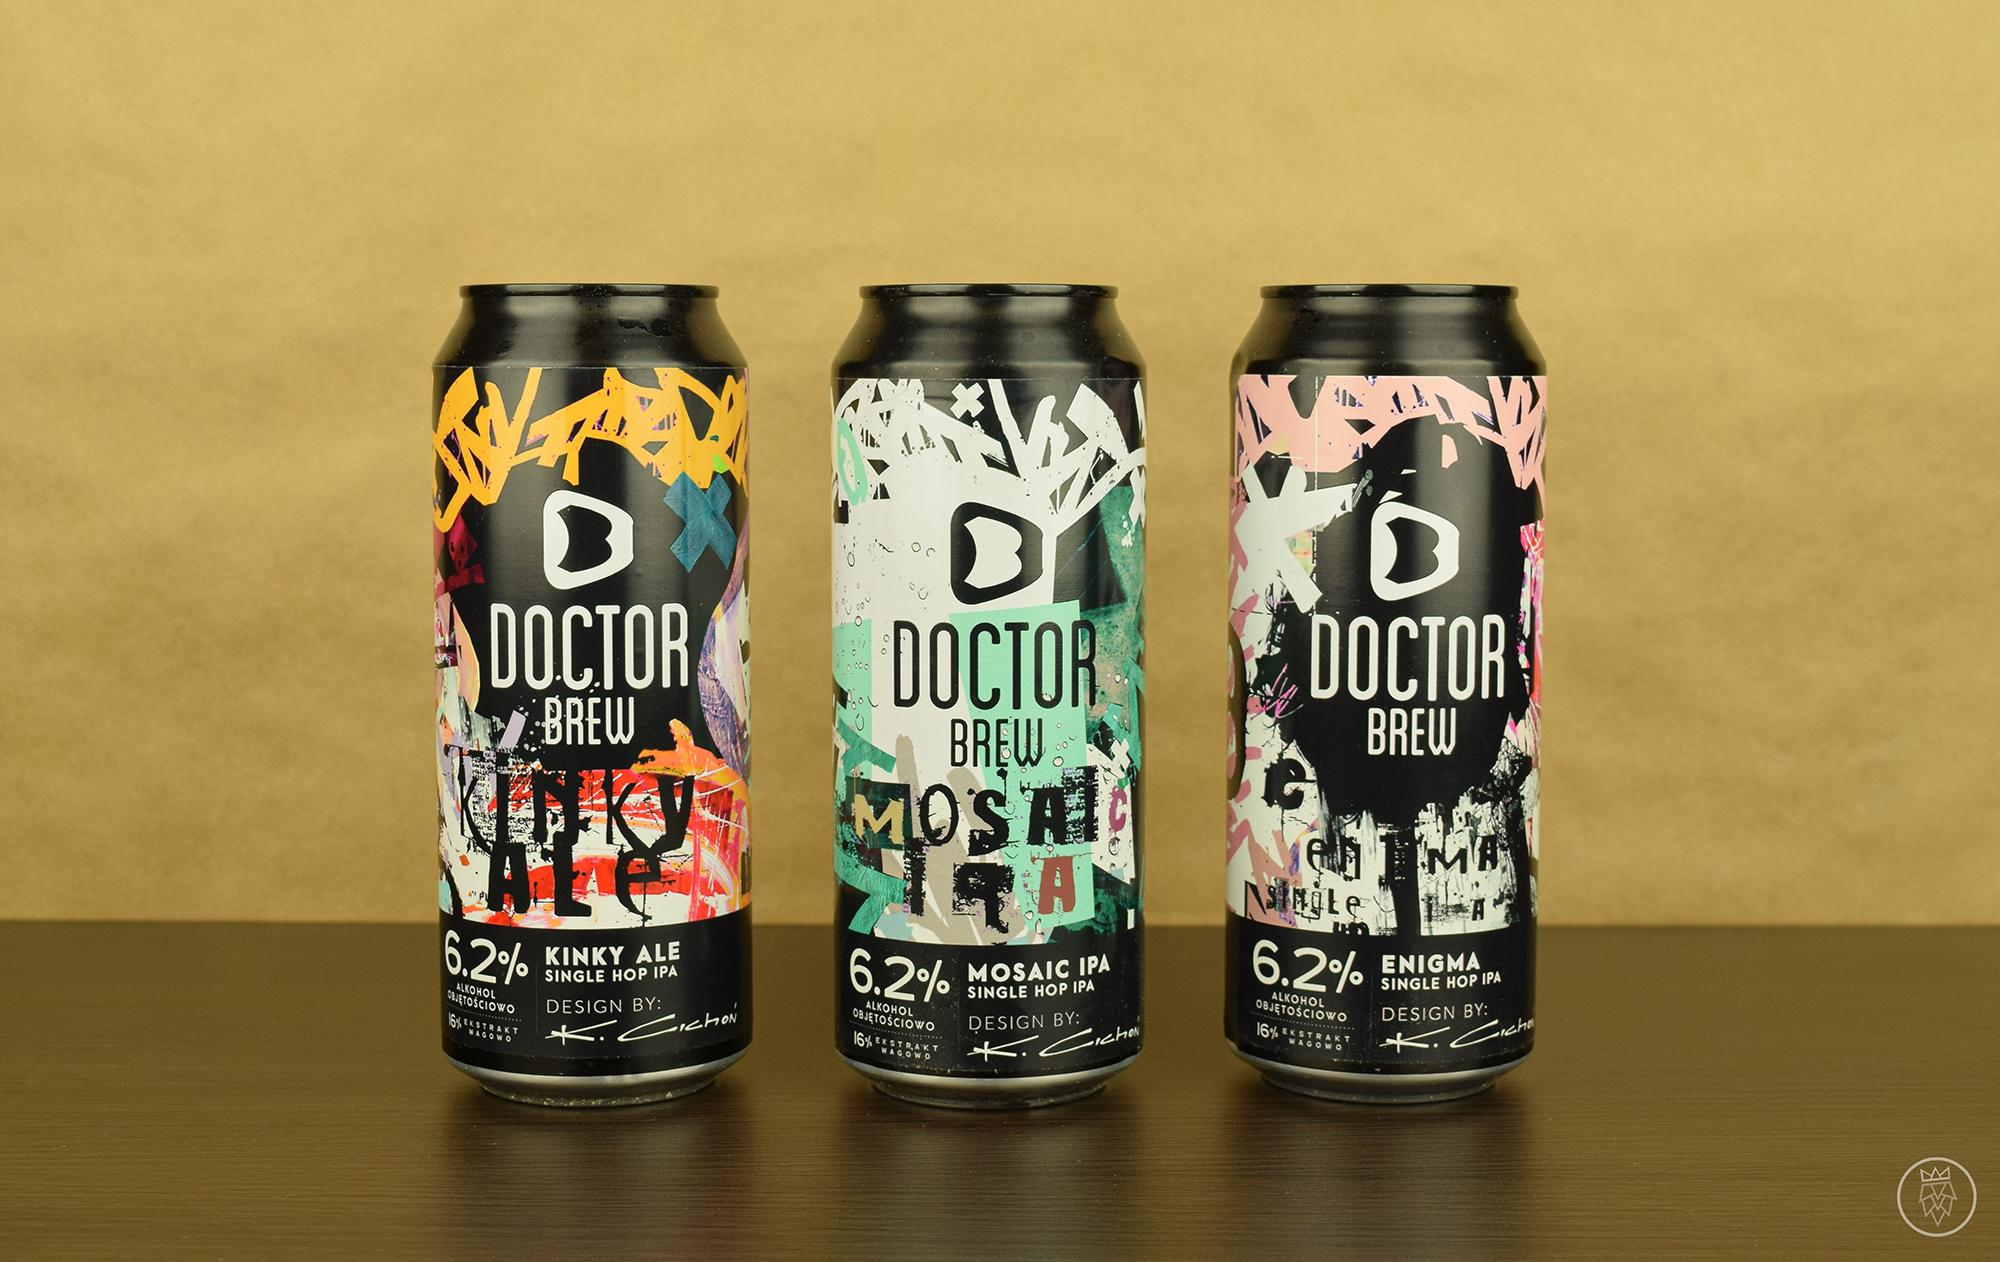 Legendy - Doctor Brew